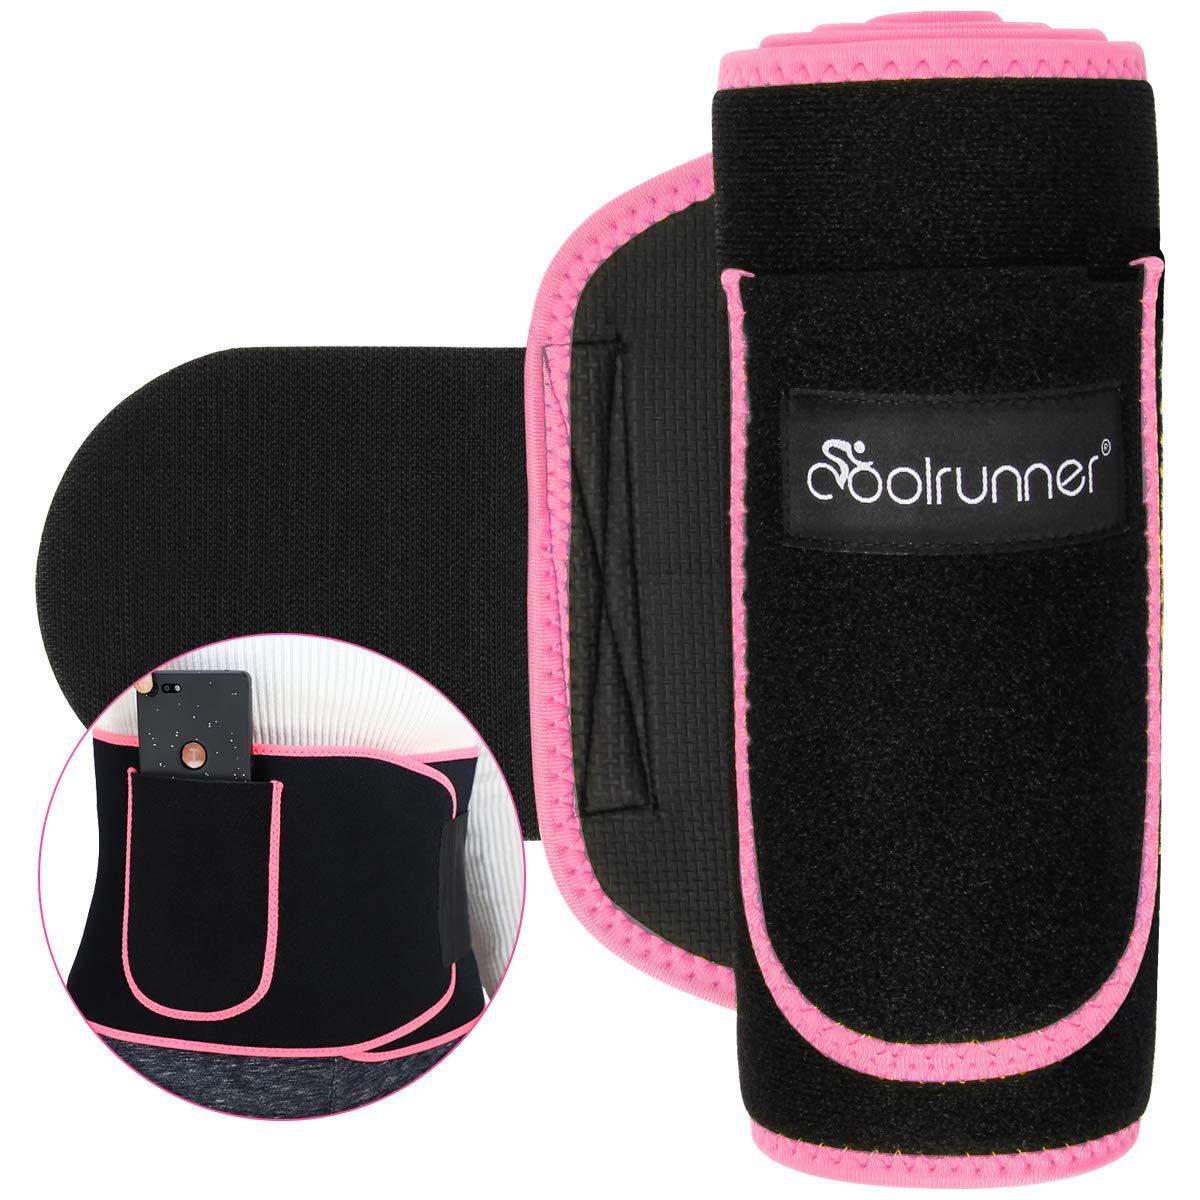 Coolrunner Sweat Waist Trimmer, Waist Trimmer Belt for Women Men, Workout Neoprene Ab Belt for Weight Loss Slimmer Kit, Stomach Fat Burner, Low Back Lumbar Support with Sauna Suit Effect, Phone Pocket